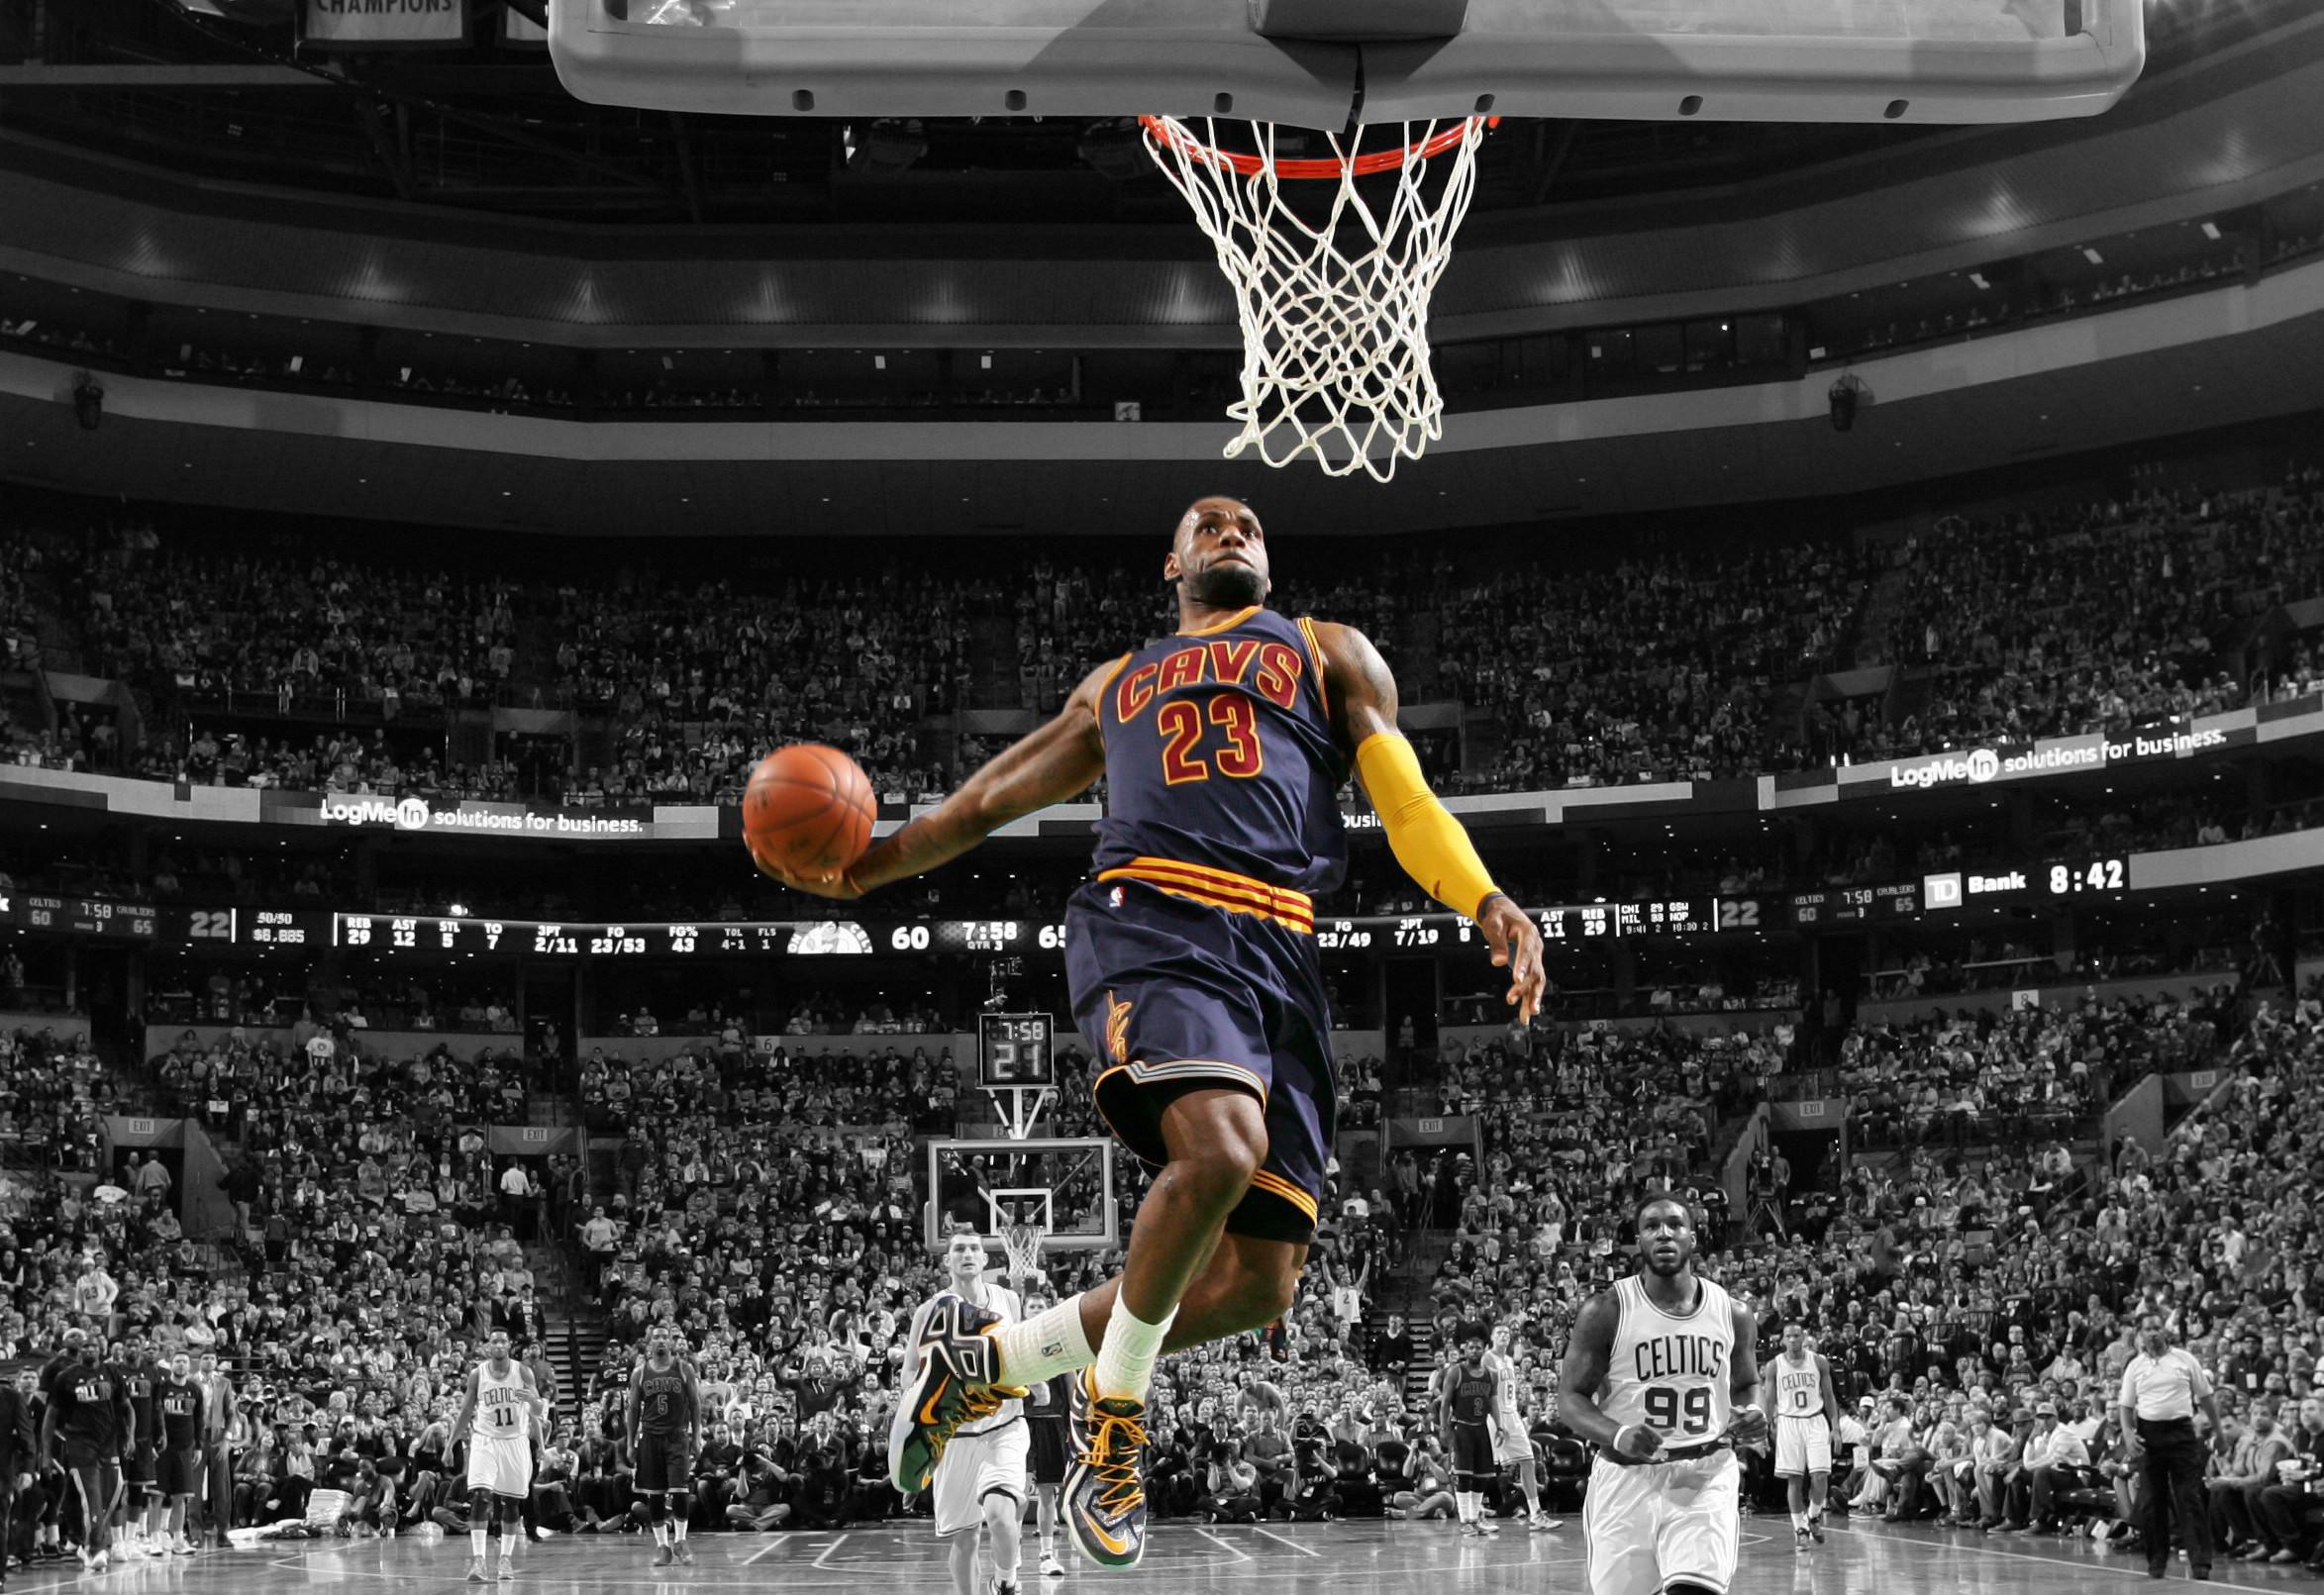 Basketball Wallpaper: HD Basketball Wallpapers ·① WallpaperTag